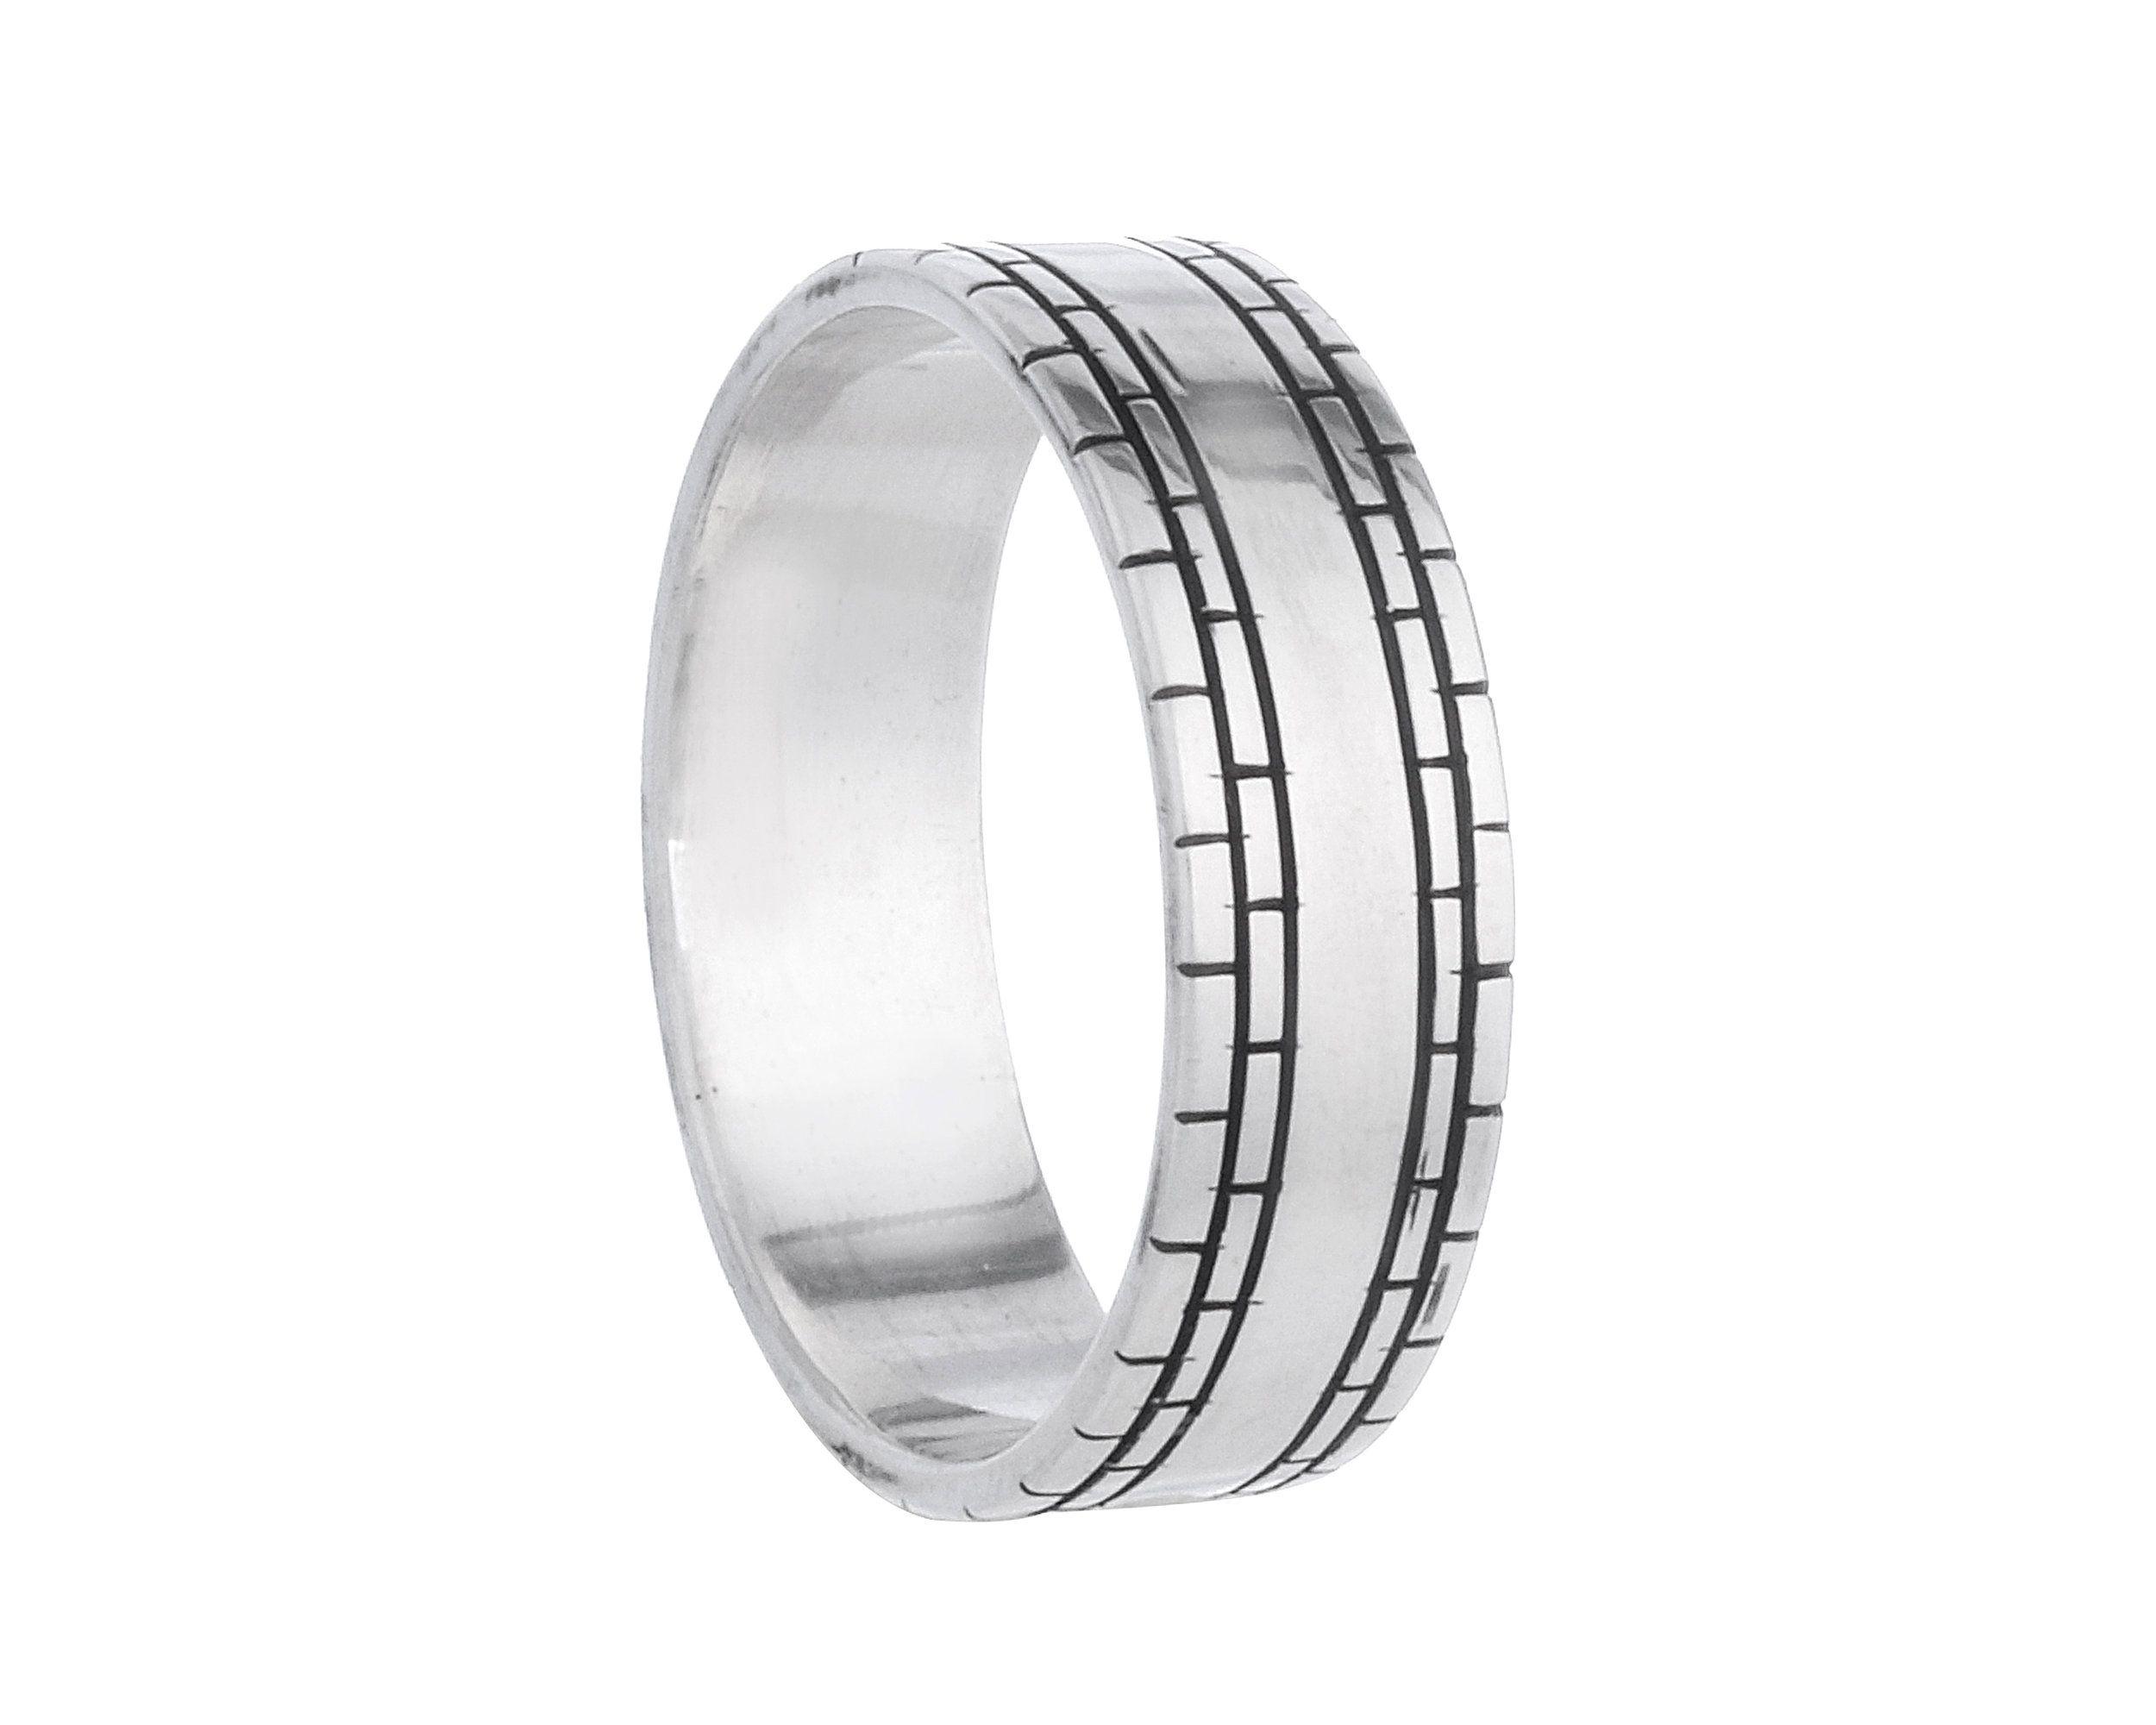 925 Sterling Silver Men S Ring Sterling Silver Wedding Etsy In 2021 Silver Wedding Bands Rings For Men Sterling Silver Wedding Band